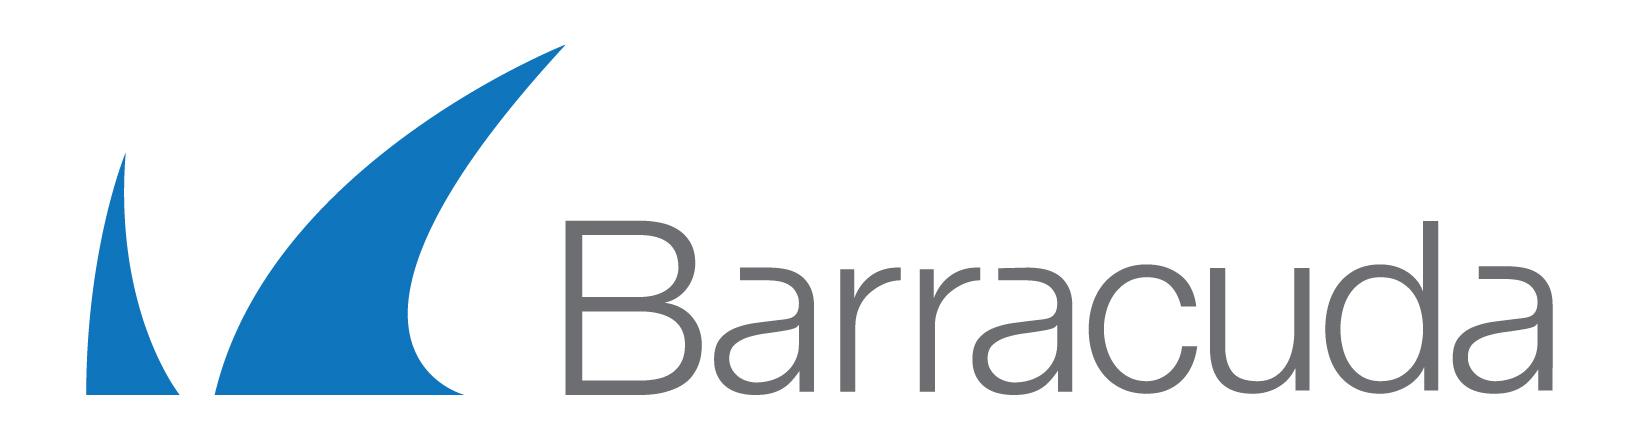 barracuda launches barracuda firewall x100 and x101